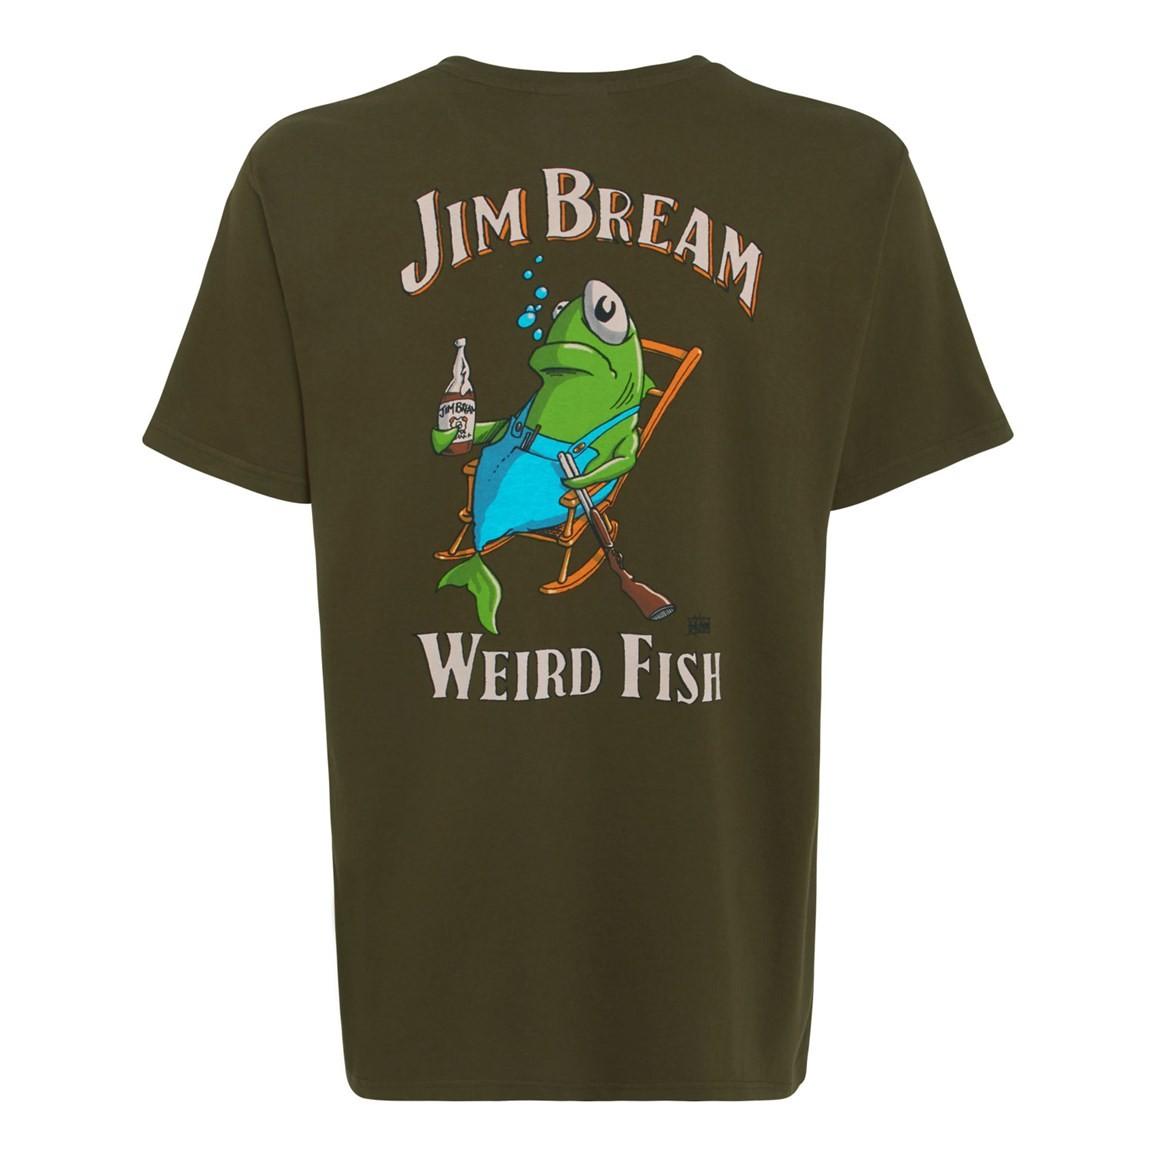 Jim Bream Printed Artist T-Shirt Olive Night